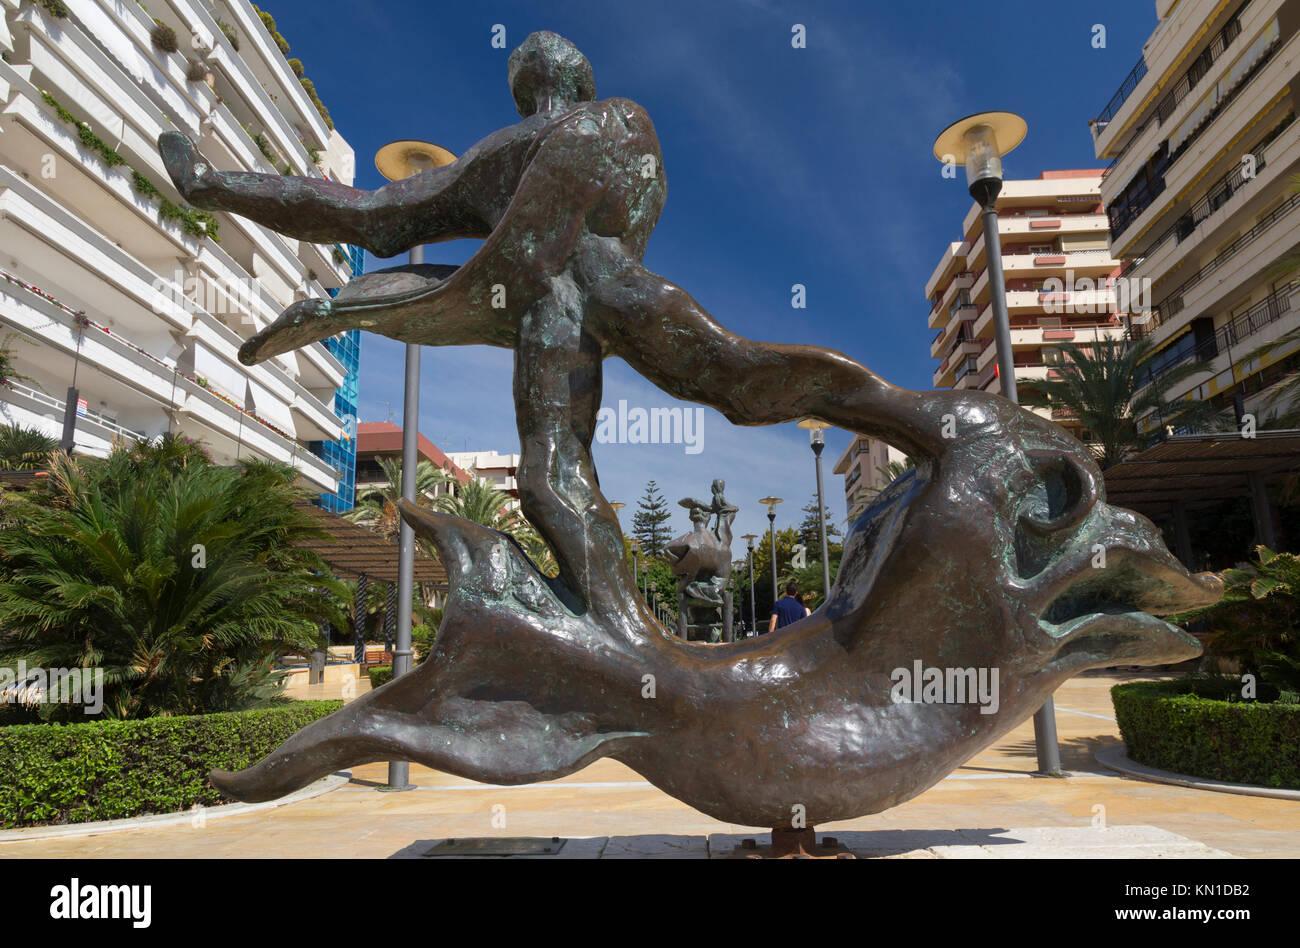 Hombre Sobre Delfín (Man above dolphin): One of Salvador Dali's sculptures in Avenida del Mar, Marbella, - Stock Image